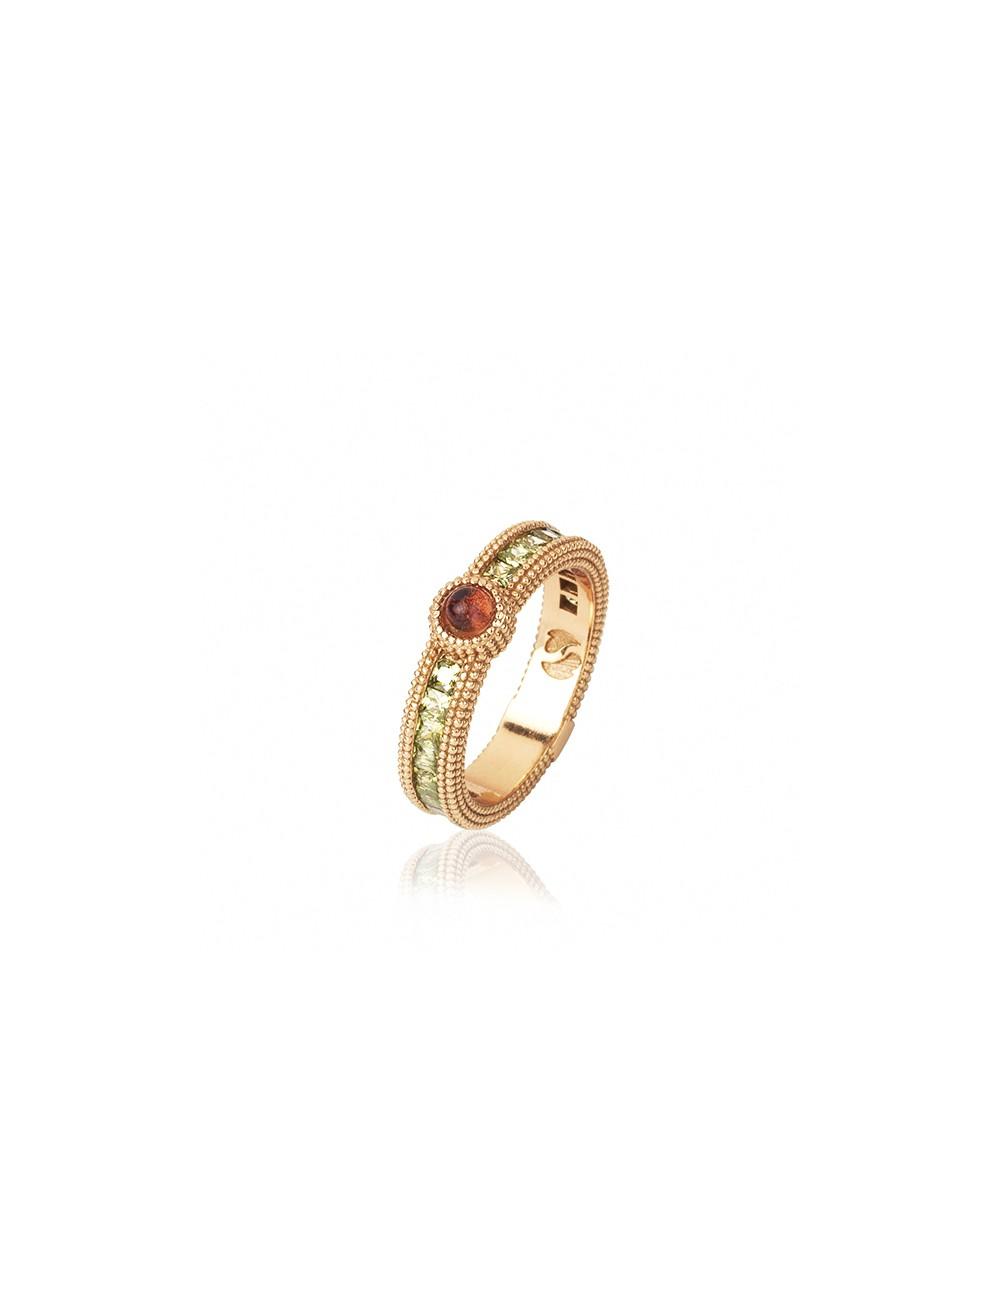 Sunfield -Anillo Sunfield plata baño oro rosa, turmalina rosa y circonitas -AN062340/2/26